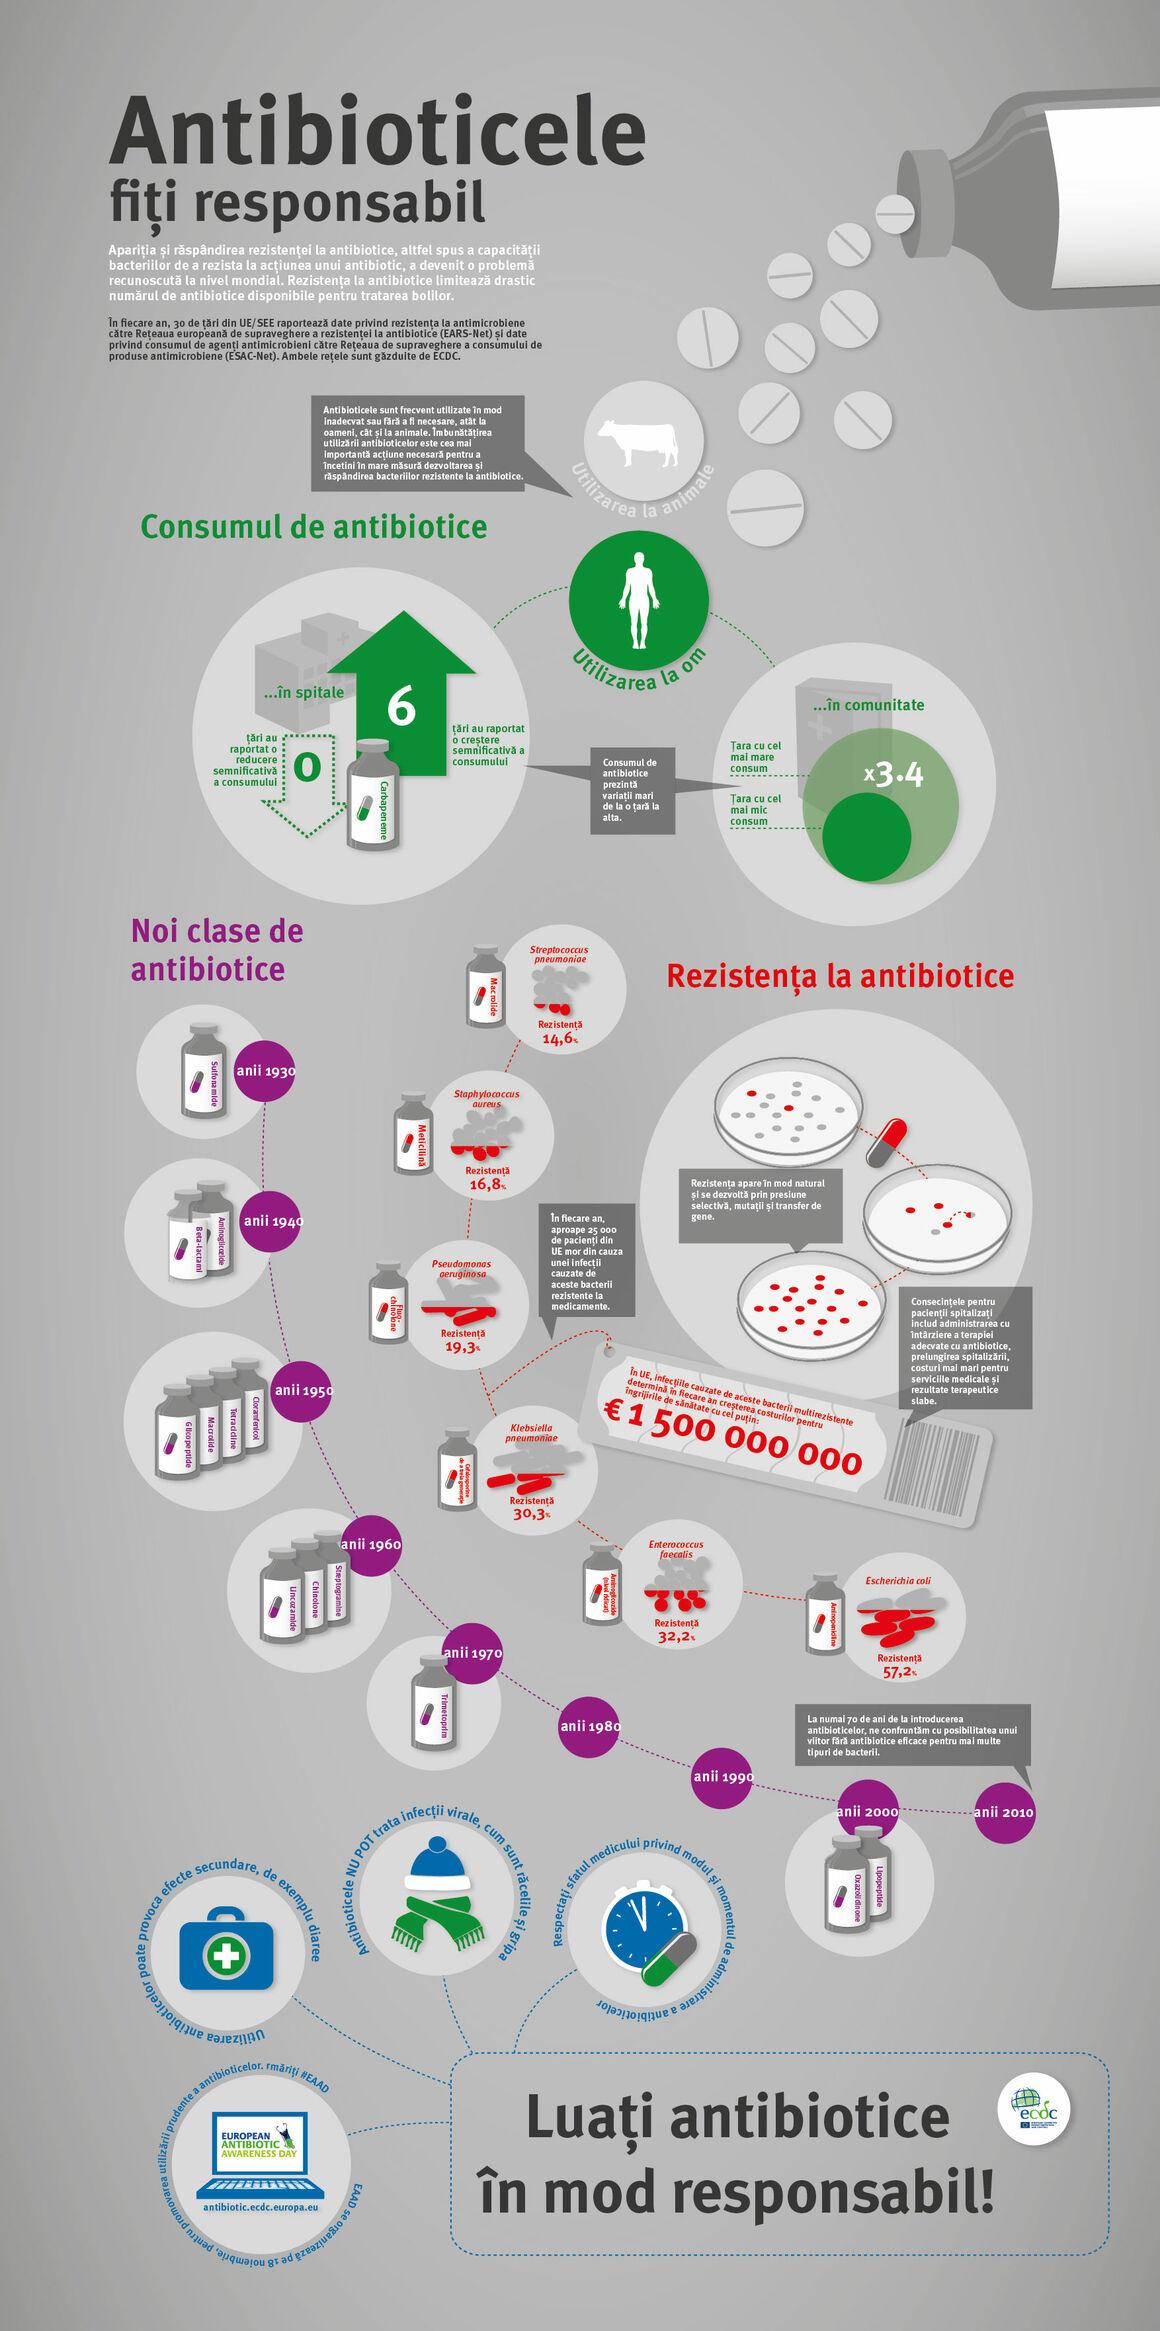 Antibioticele - fiți responsabil